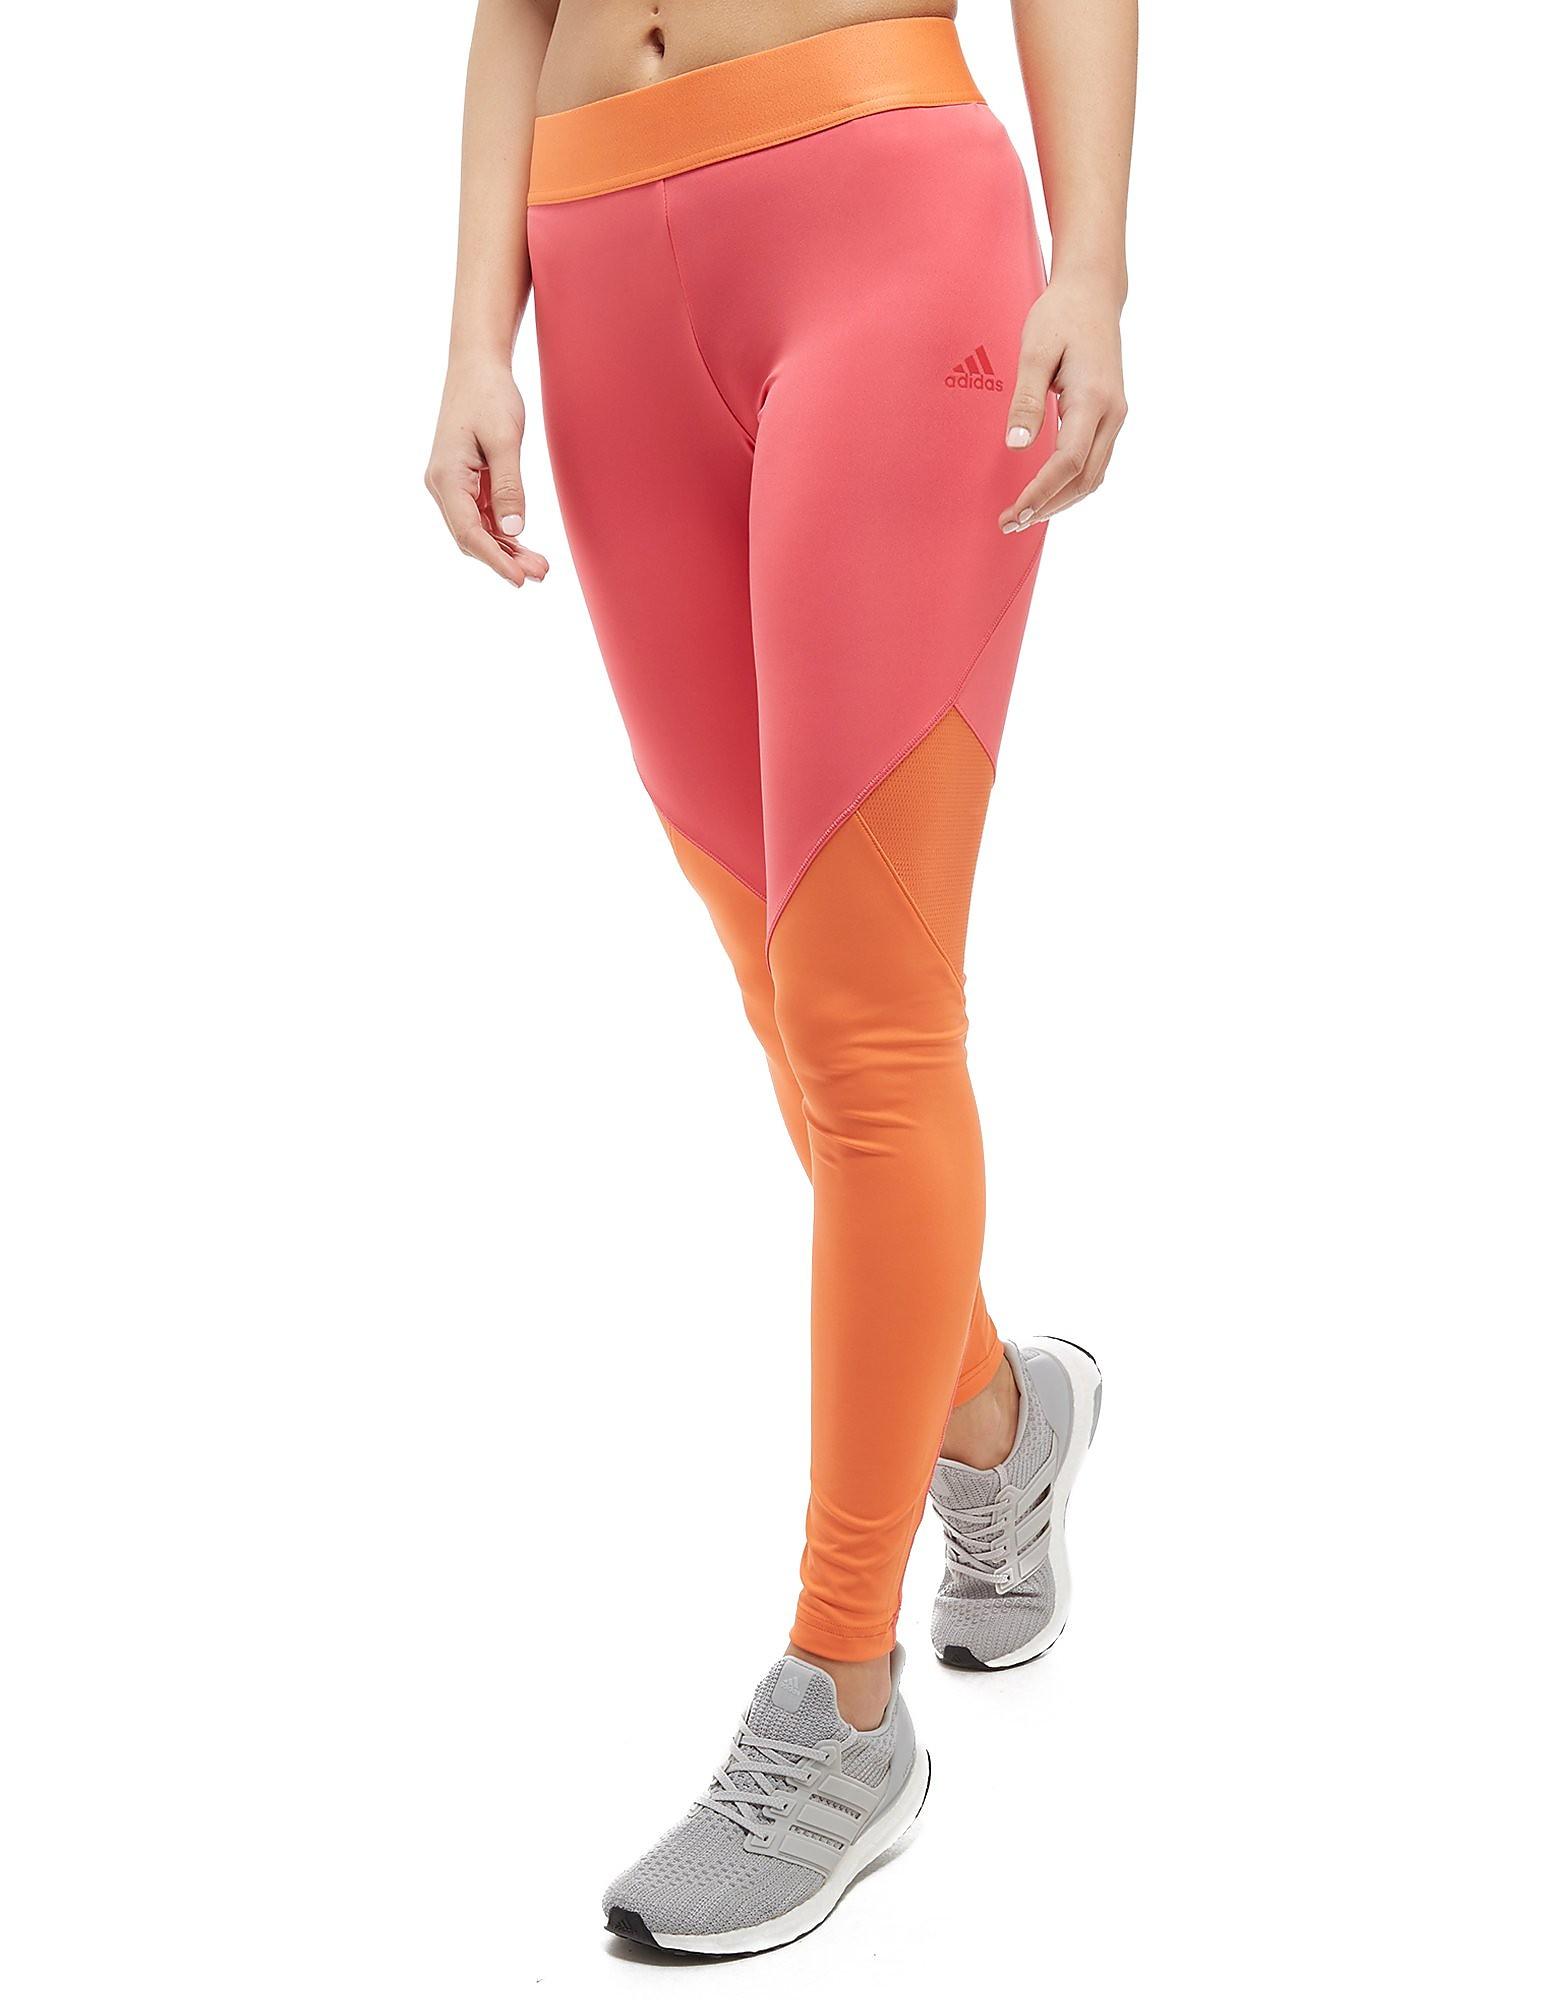 adidas Collants Climacool Logo Femme - Orange/Pink, Orange/Pink